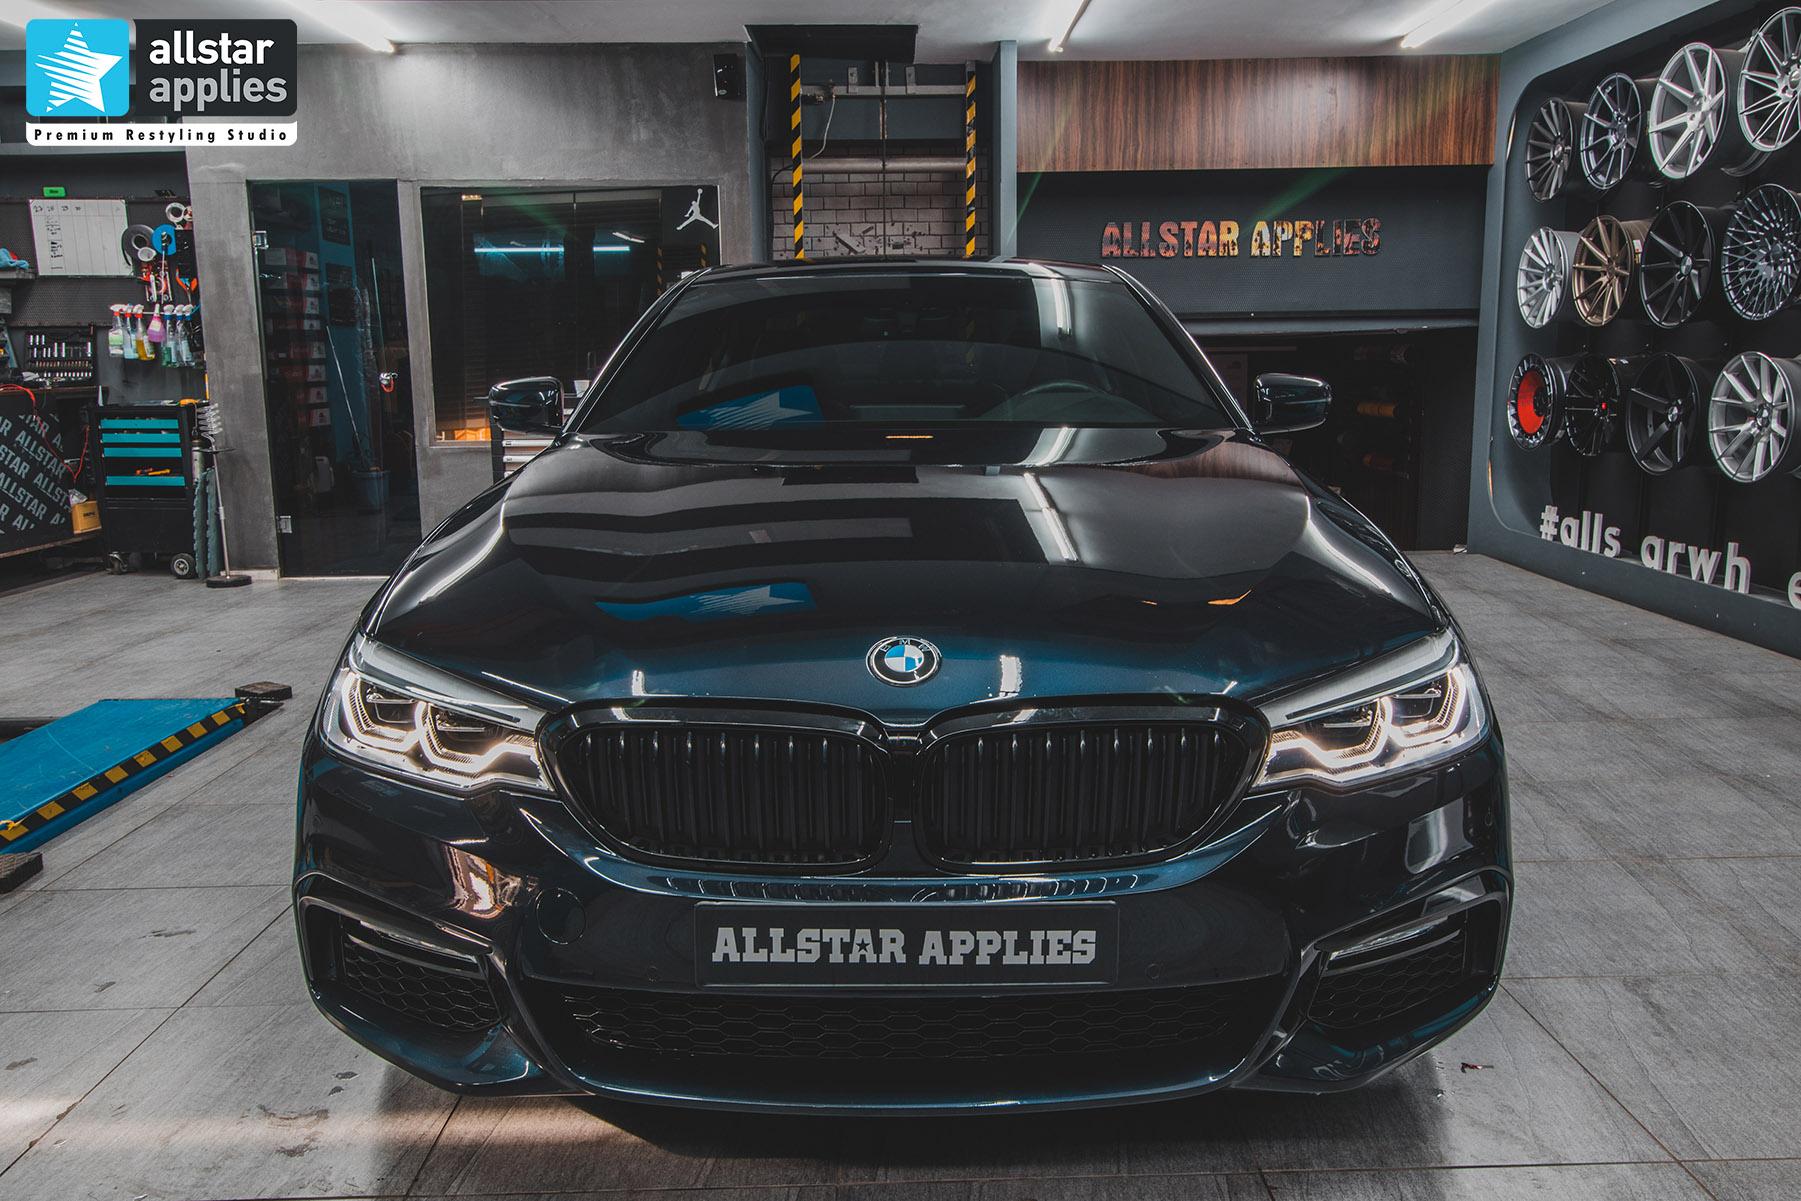 BMW G30 5 SERIES M ALLSTAR APPLIES PPF 13